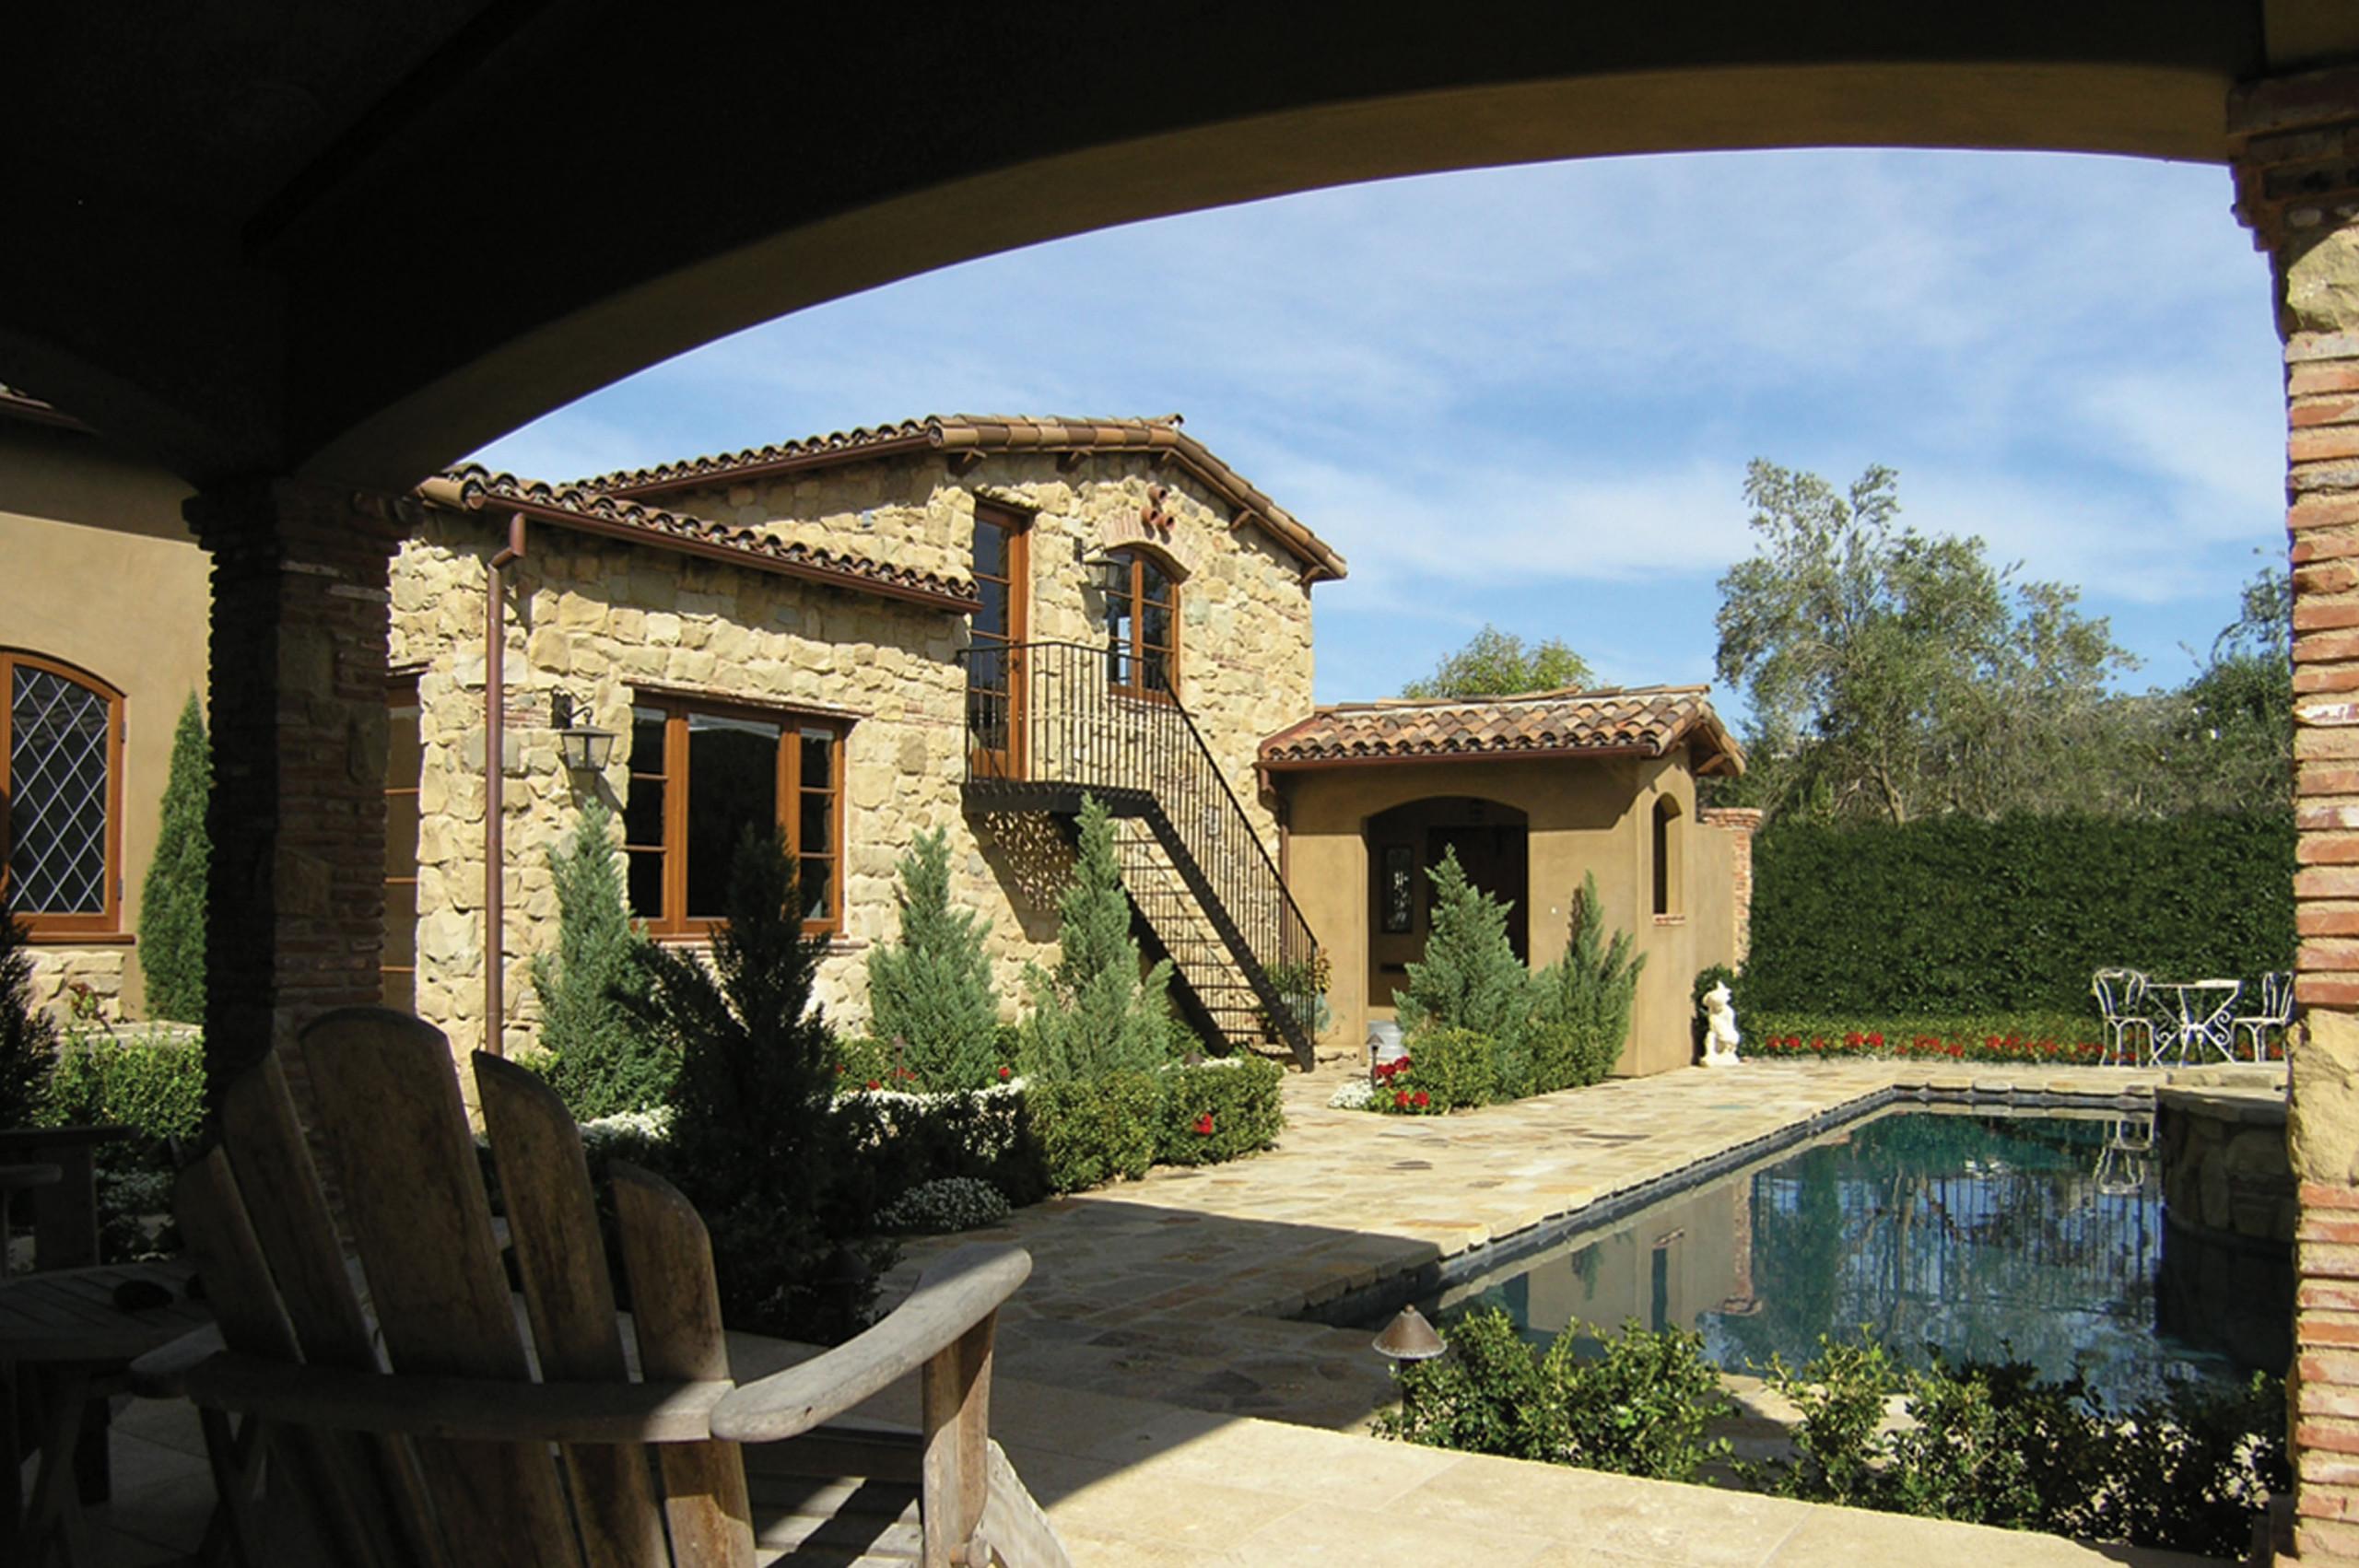 Tuscan Residence in Newport Beach